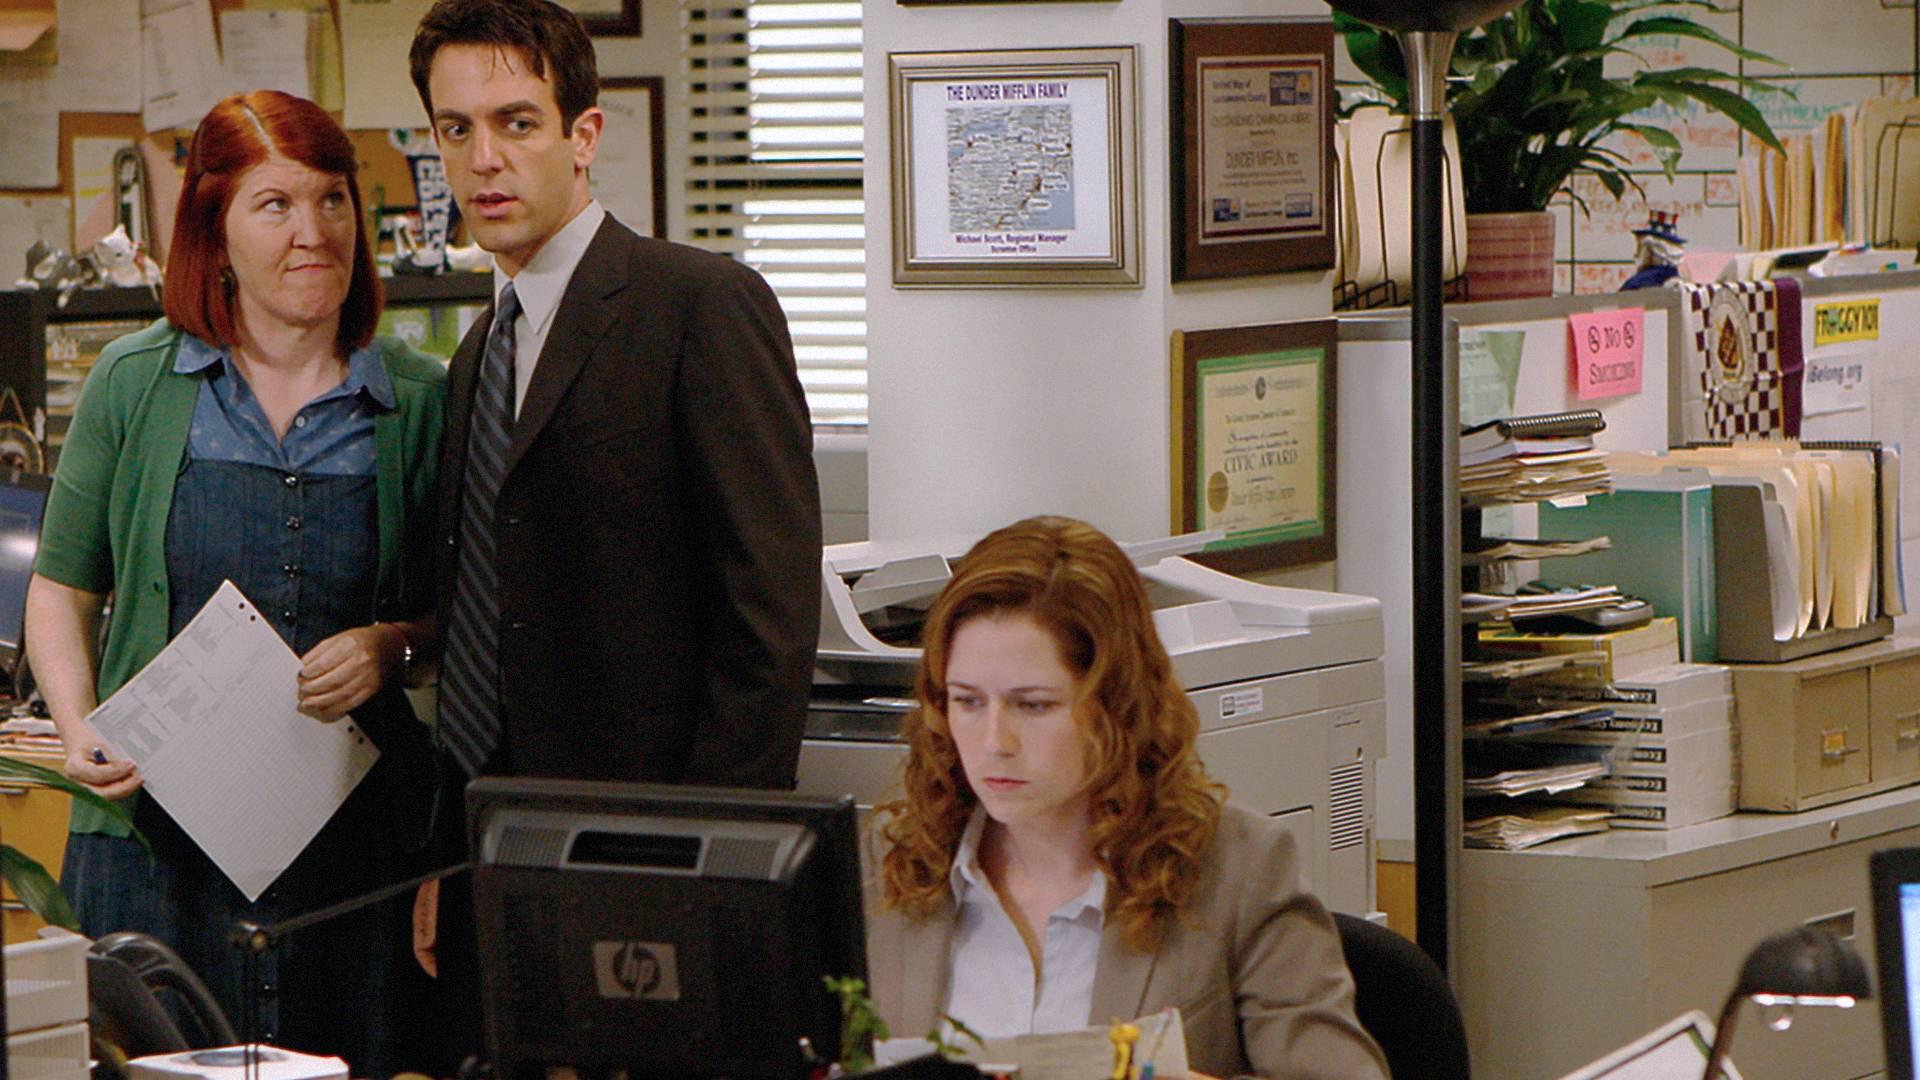 The Office Season 6 Episode 1